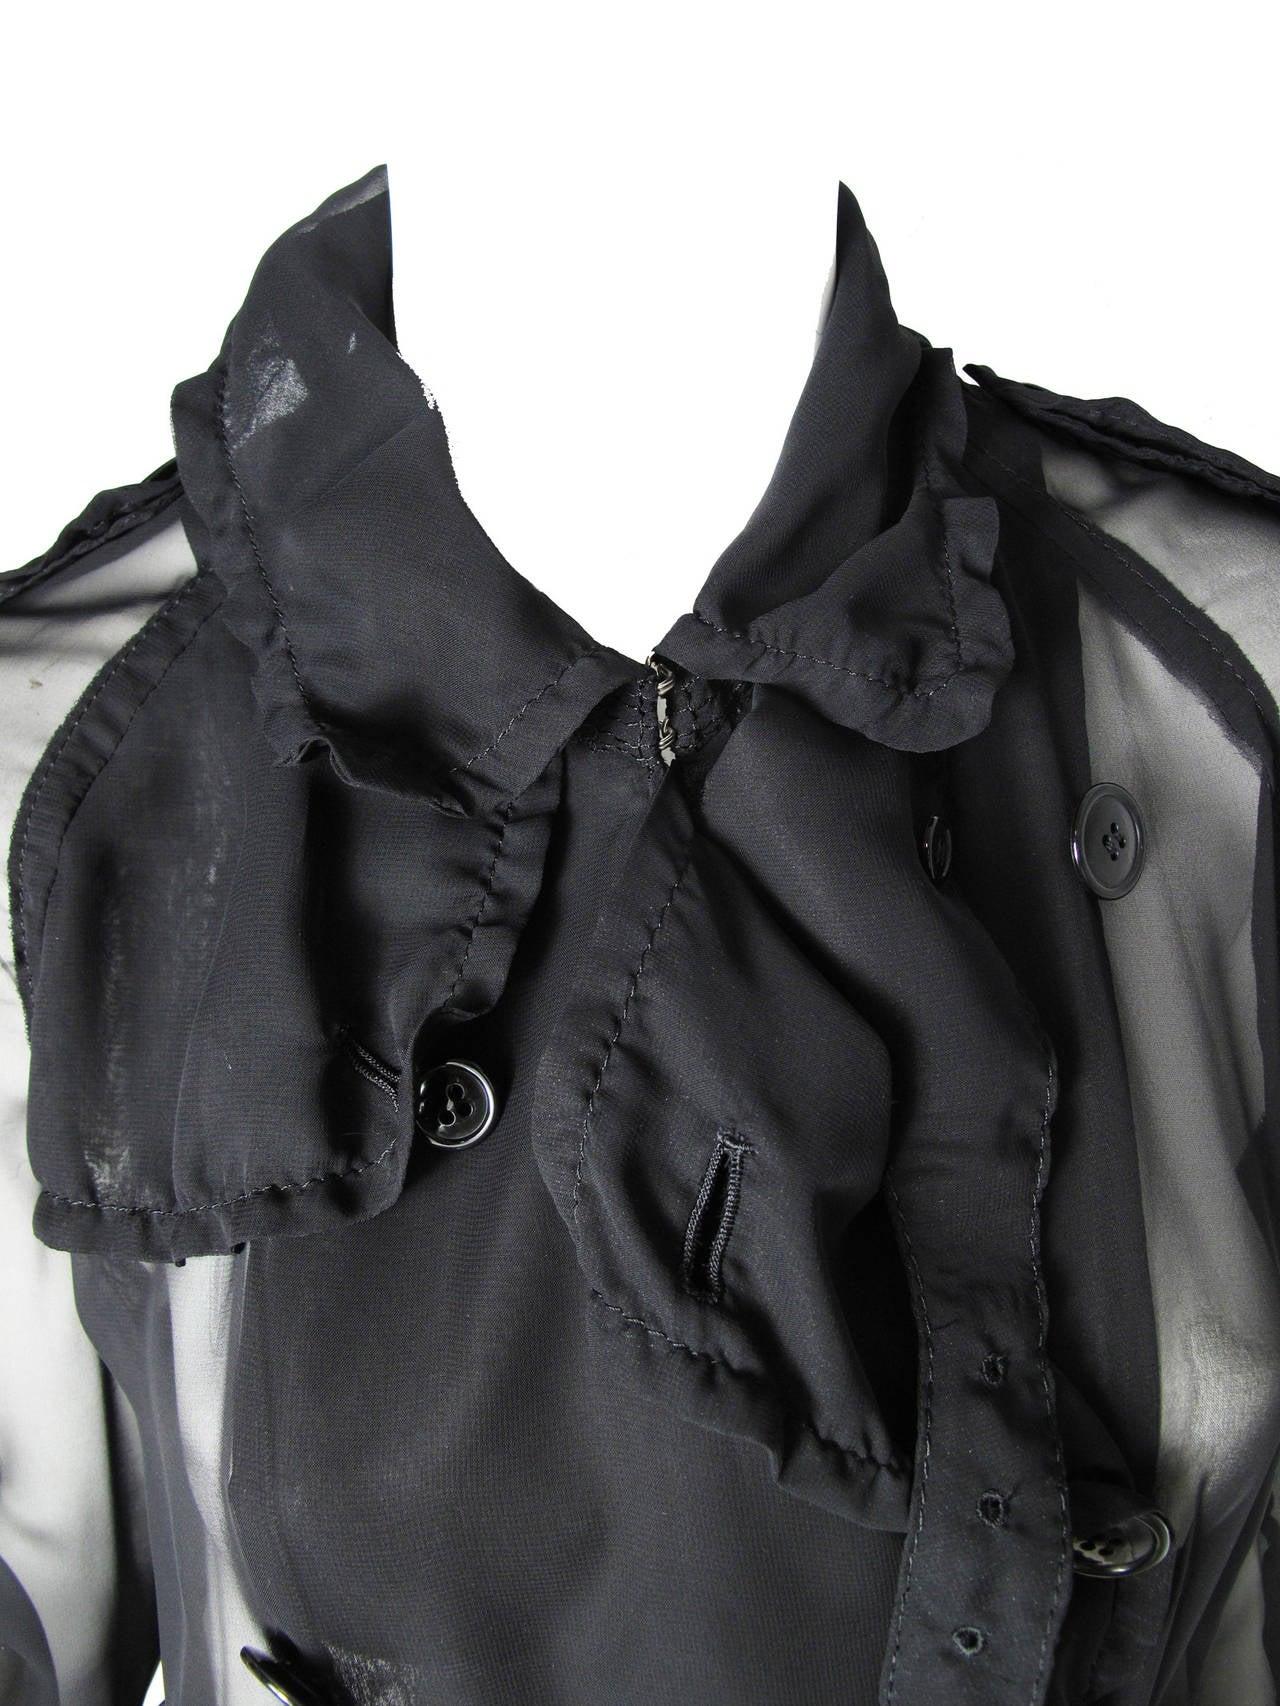 2009 Comme des Garcons Sheer Trench Coat 2